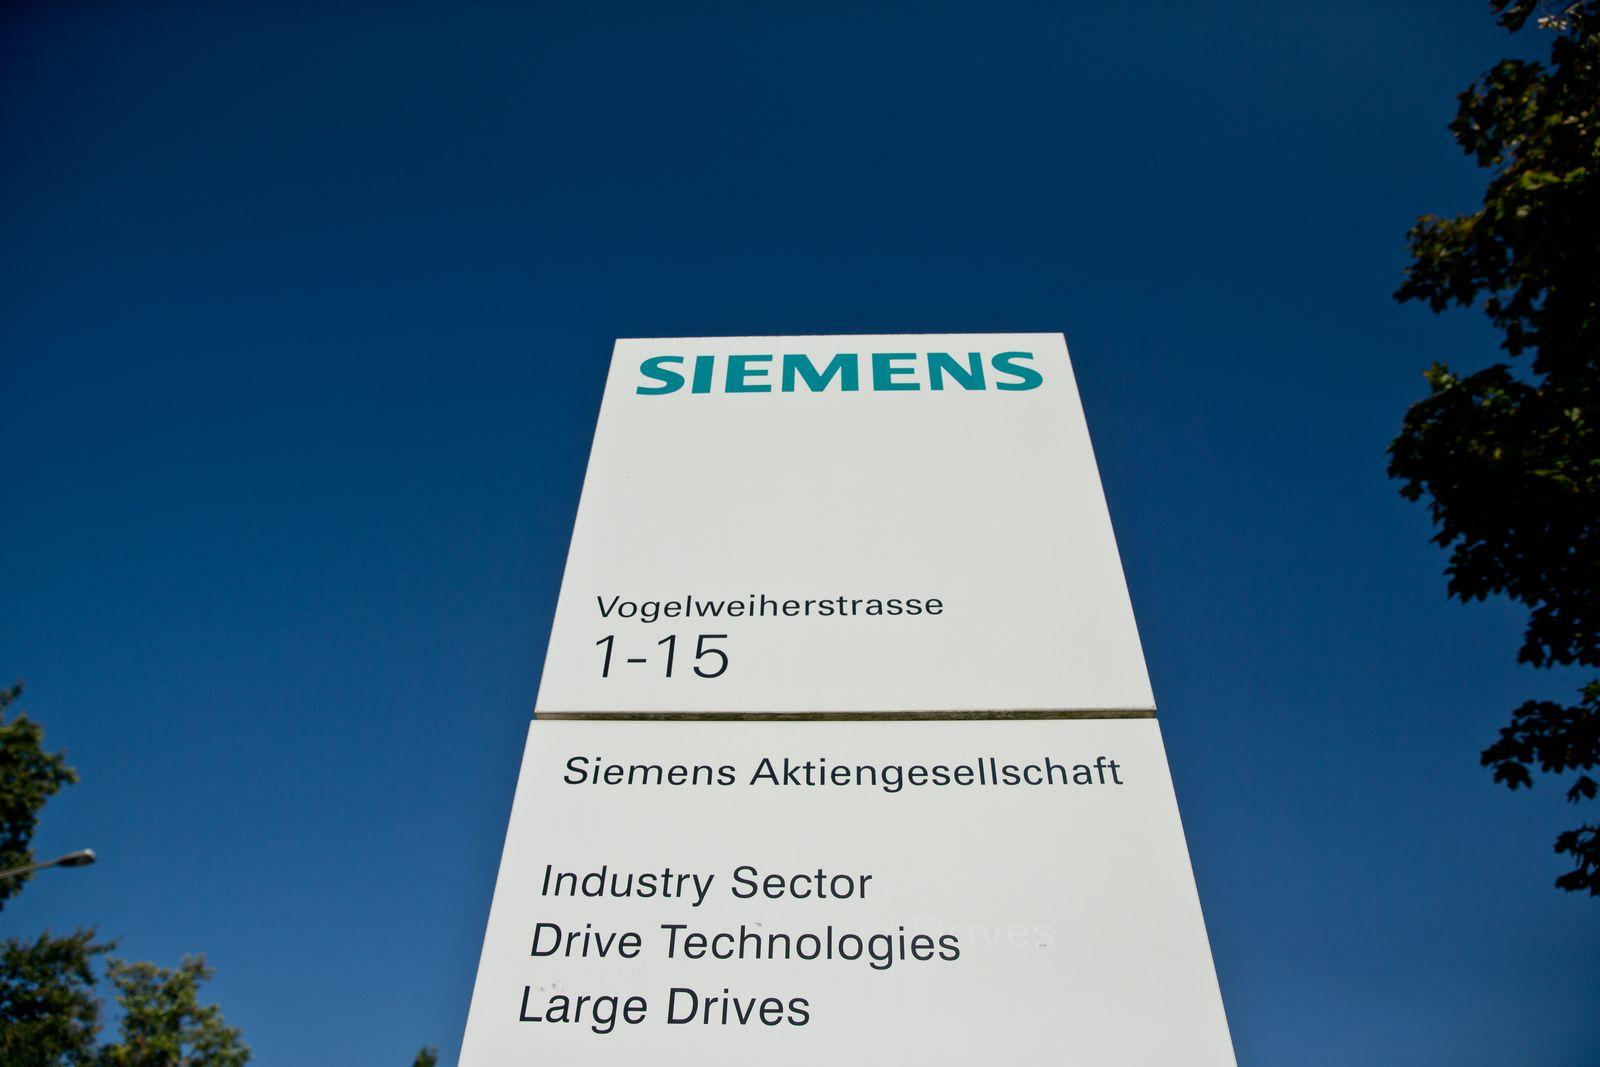 KaSP Stellenabbau bei Siemens - Standort Nürnberg